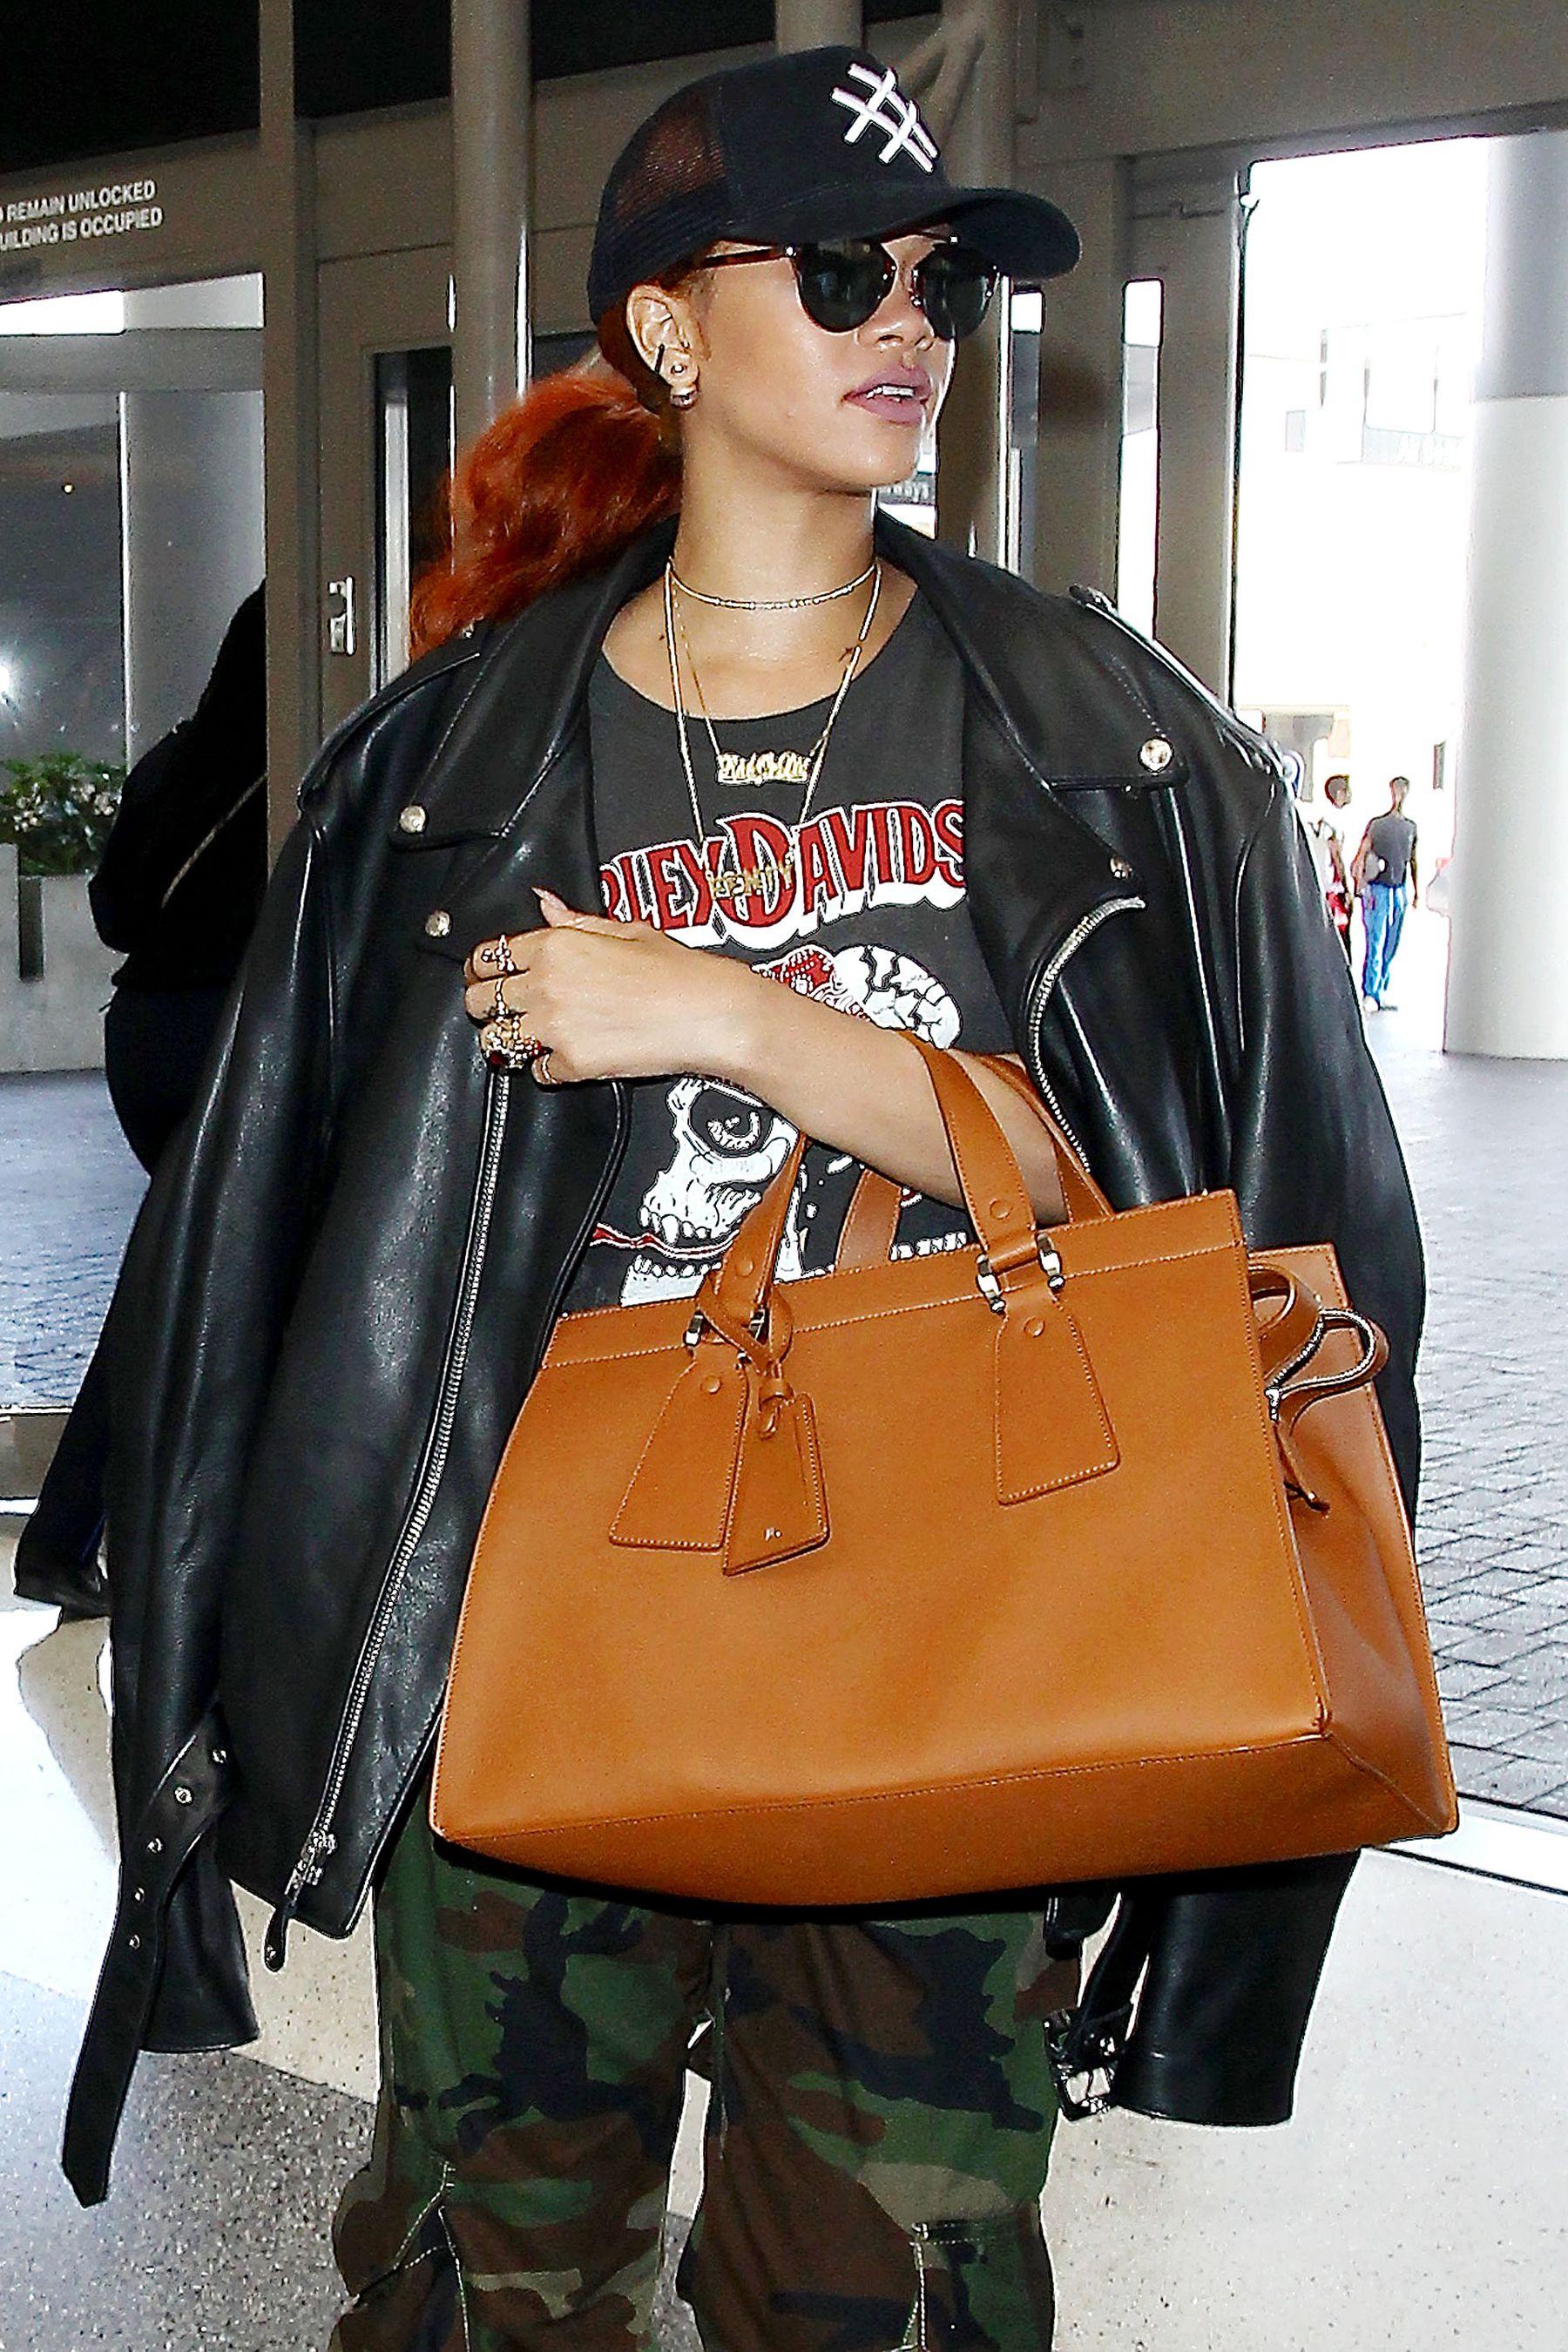 NO JUST JARED USAGE<BR/>Rihanna departs from Los Angeles International Airport on June 15, 2015. ***NO DAILY MAIL SALES***<P>Pictured: Rihanna<B>Ref: SPL1054507  150615  </B><BR/>Picture by: Splash News<BR/></P><P><B>Splash News and Pictures</B><BR/>Los Angeles:310-821-2666<BR/>New York:212-619-2666<BR/>London:870-934-2666<BR/>photodesk@splashnews.com<BR/></P>